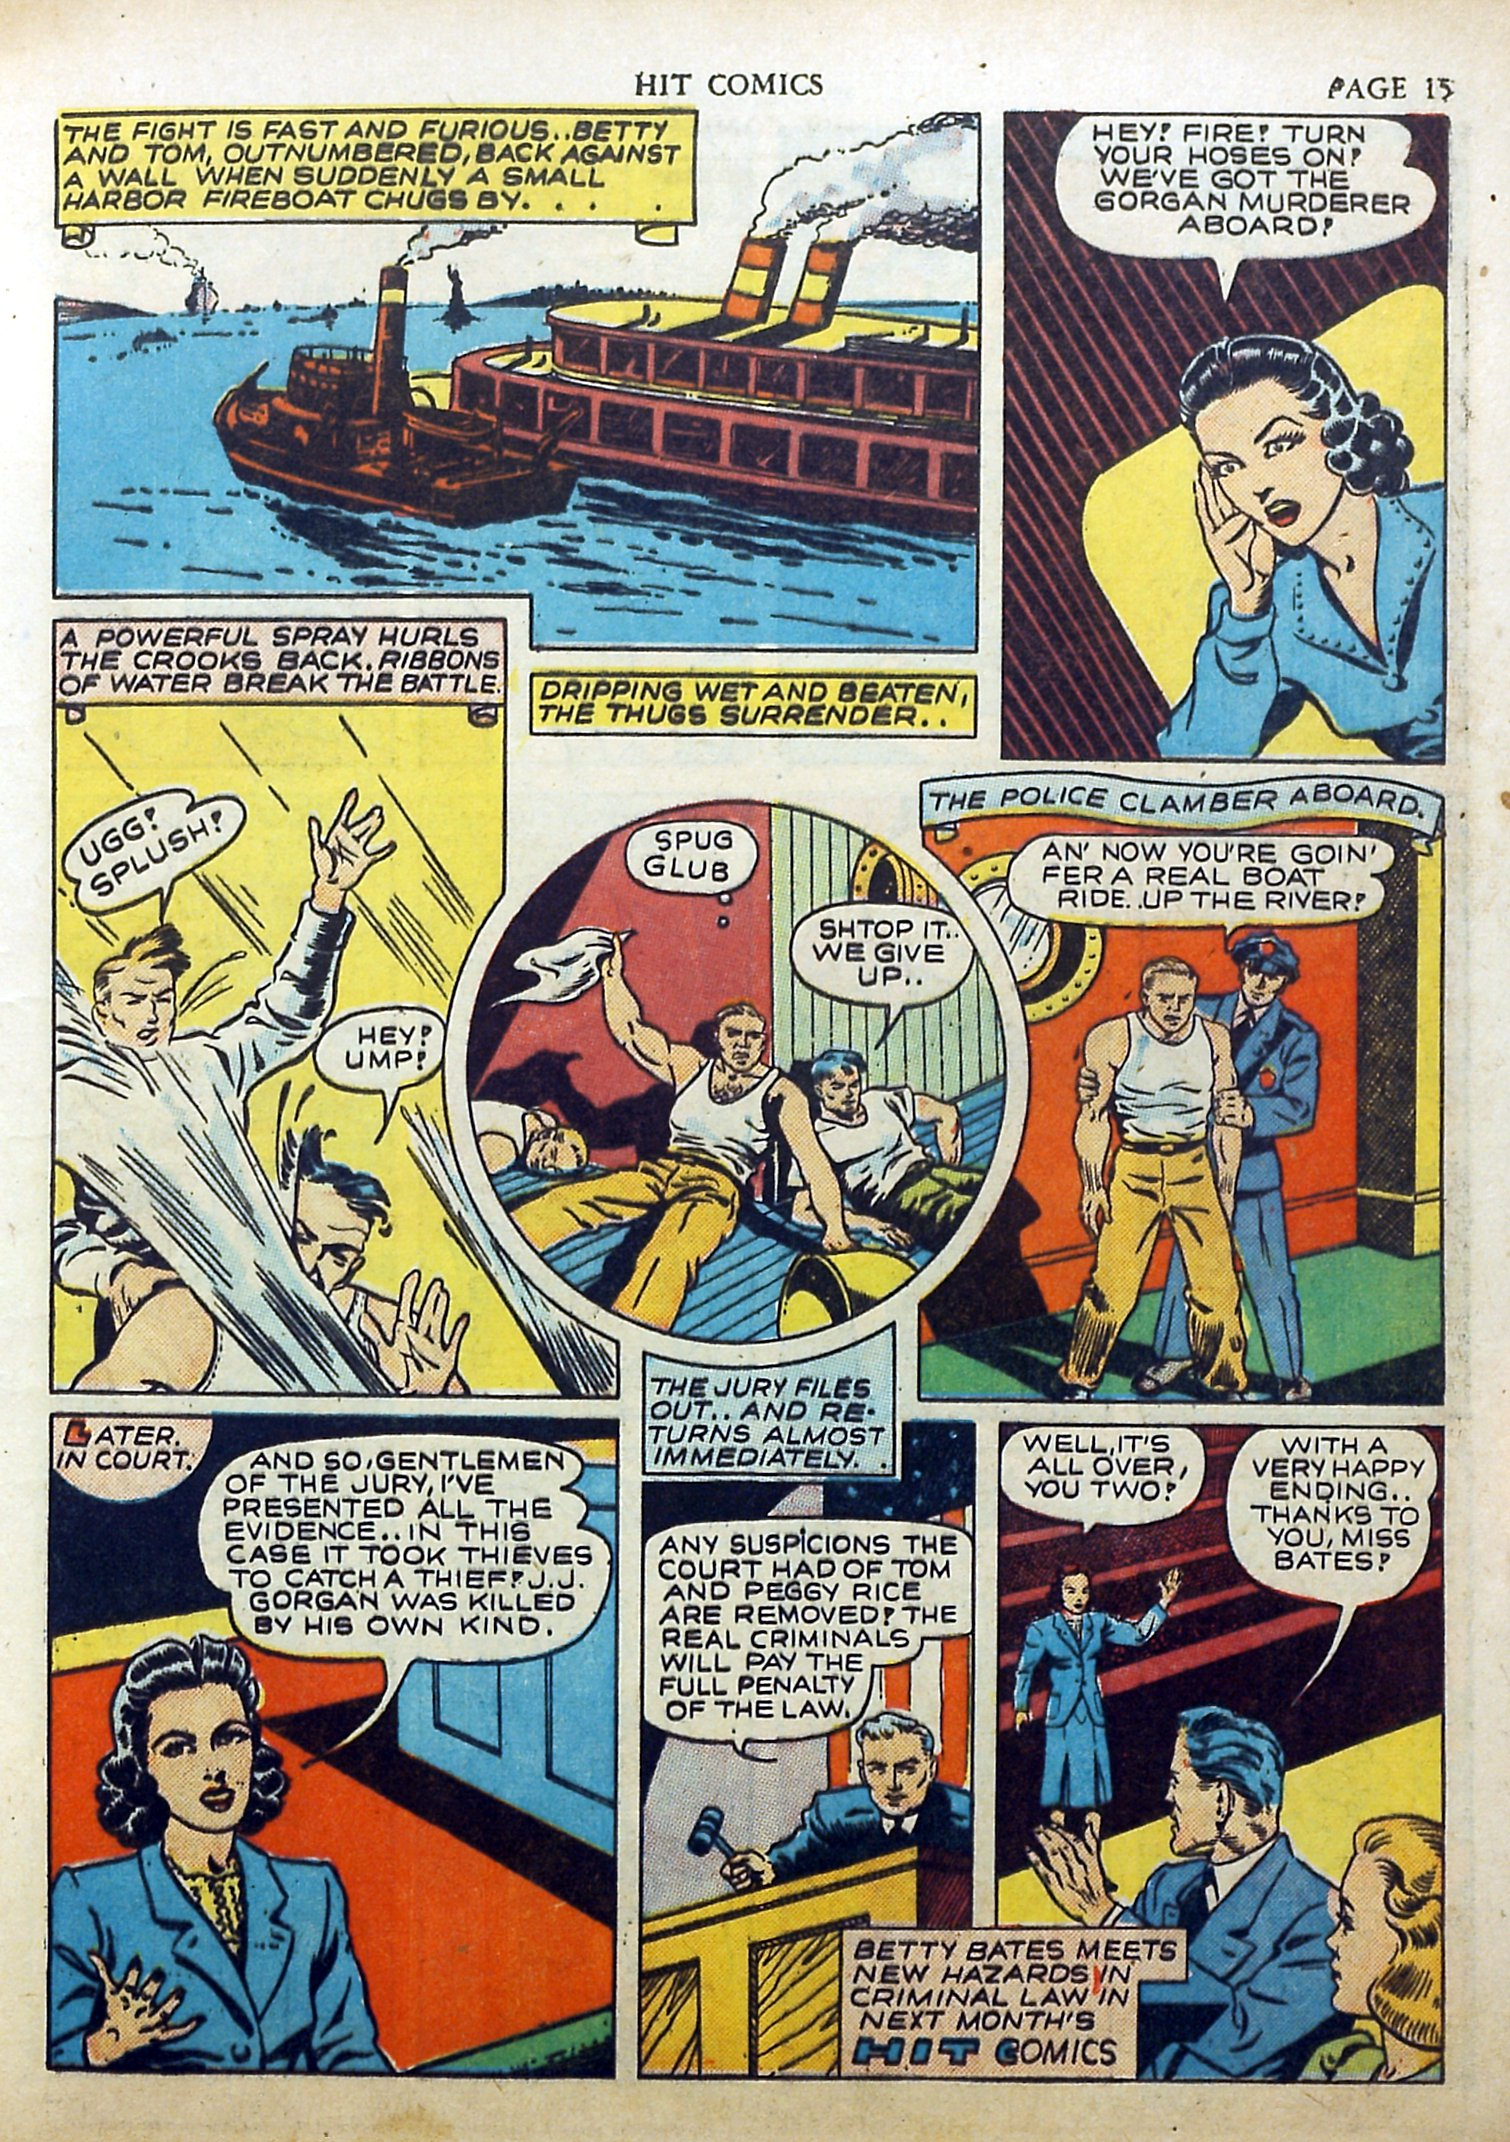 Read online Hit Comics comic -  Issue #17 - 17